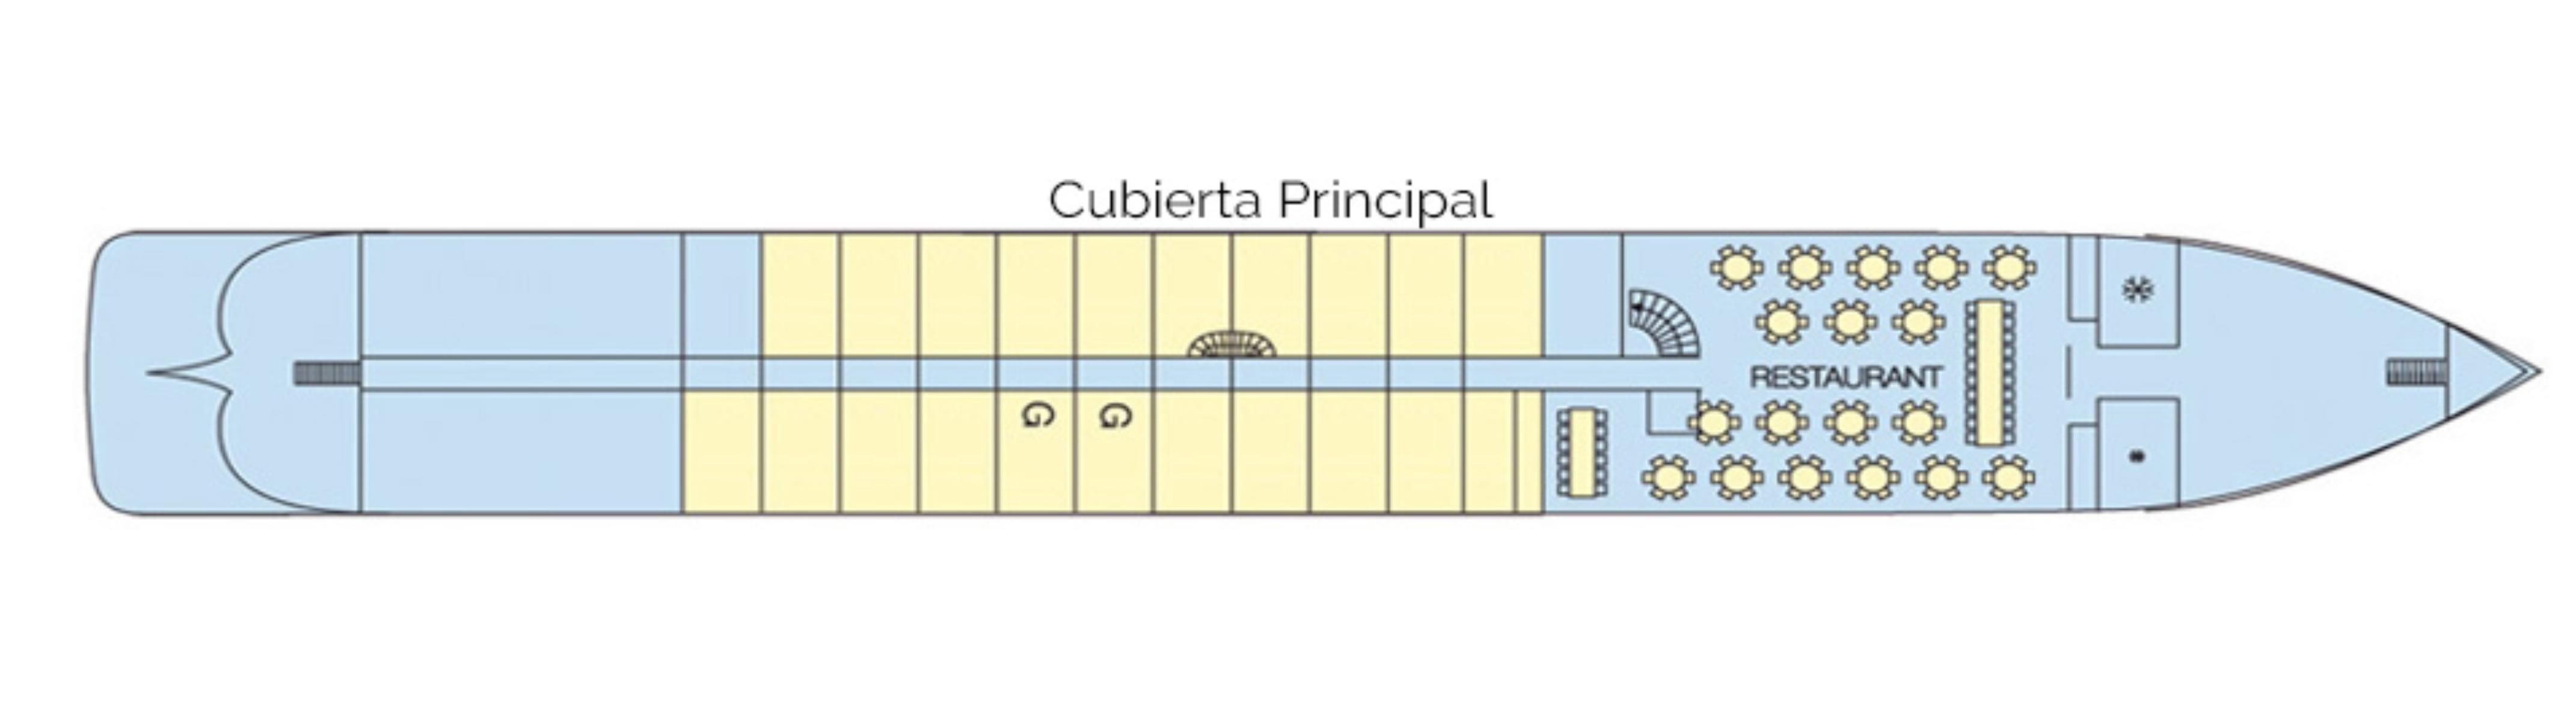 Cubierta Principal